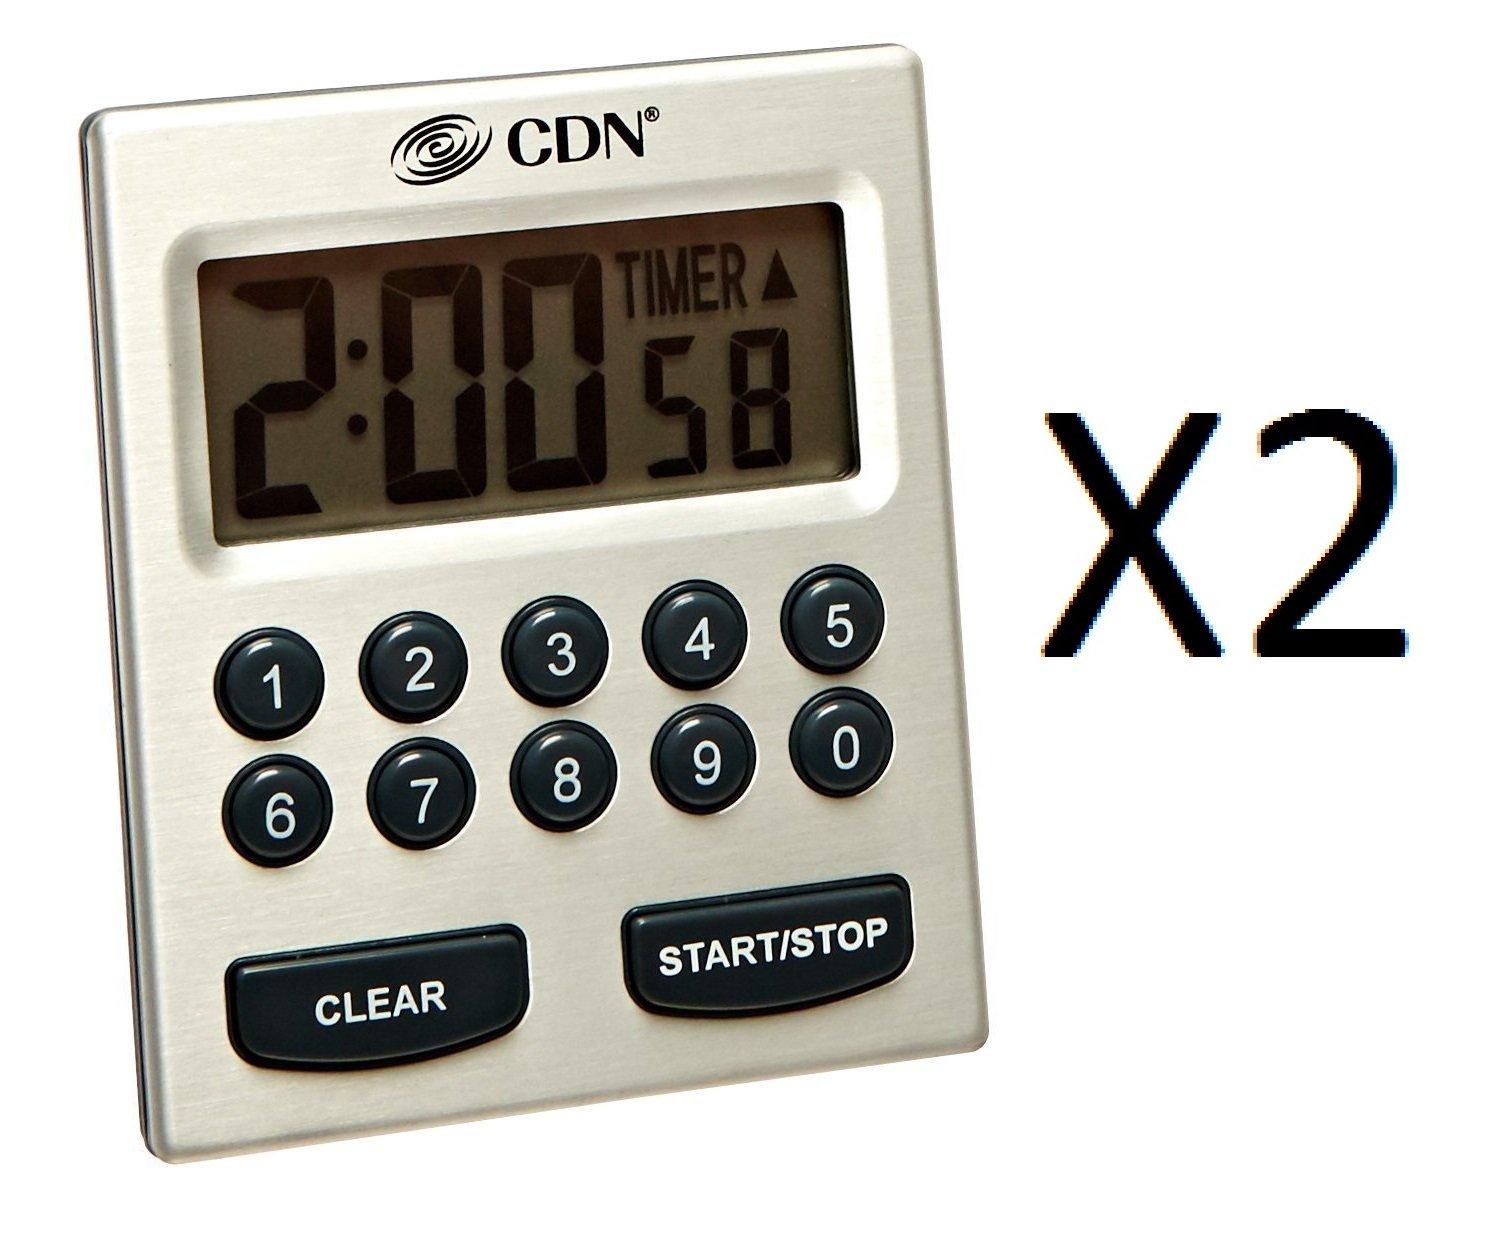 CDN TM30 Direct Entry 2-Alarm Timer-Alarm Sounds or Vibrates - 2 count